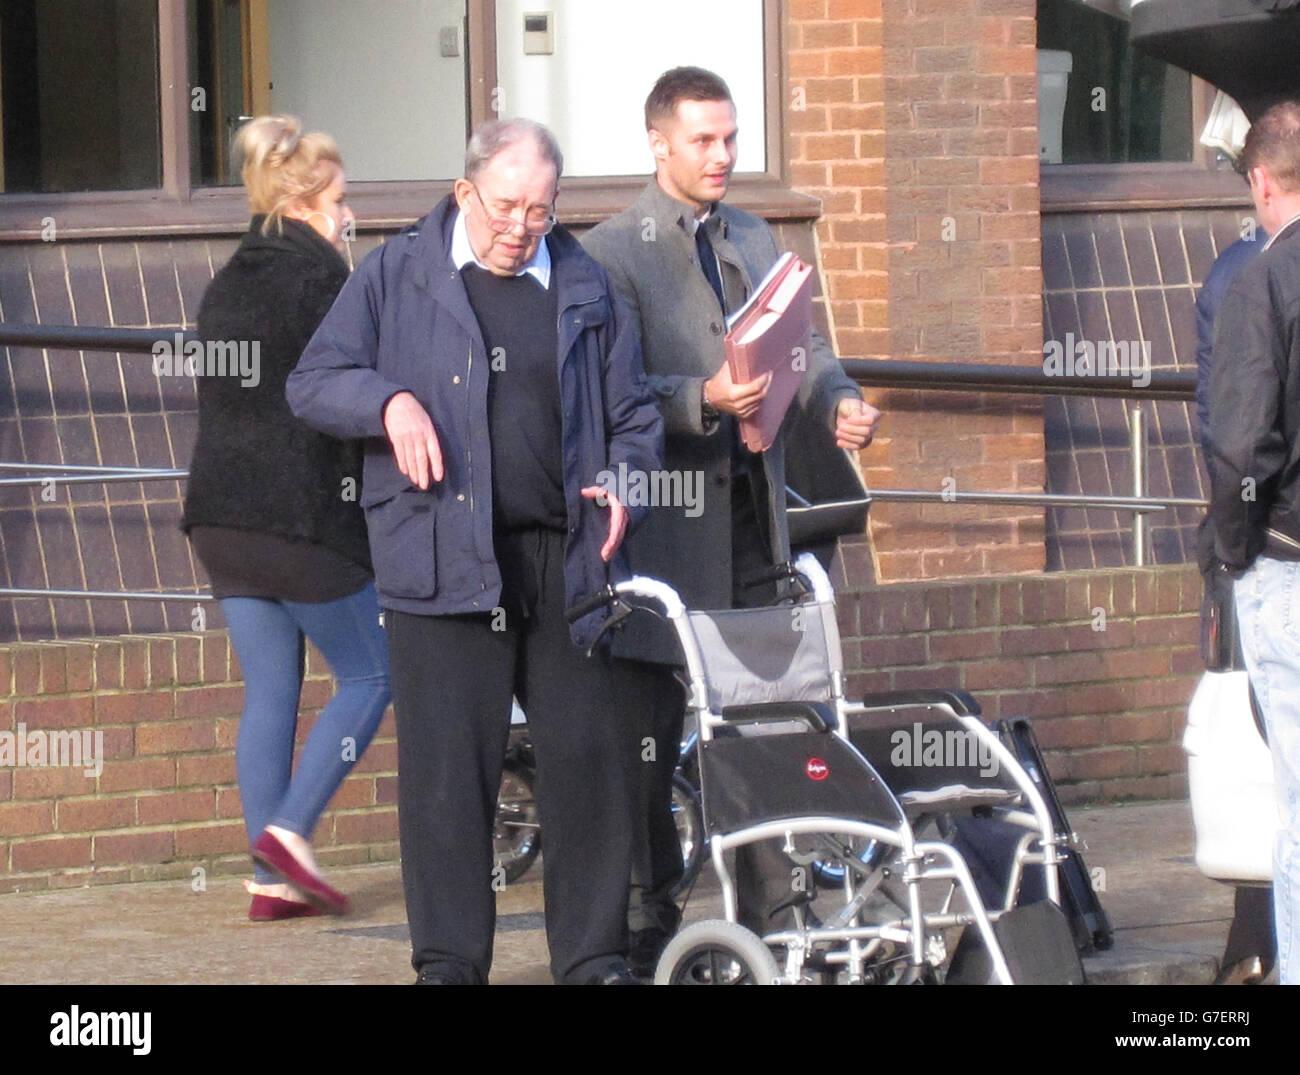 Ronald Wotton court case - Stock Image